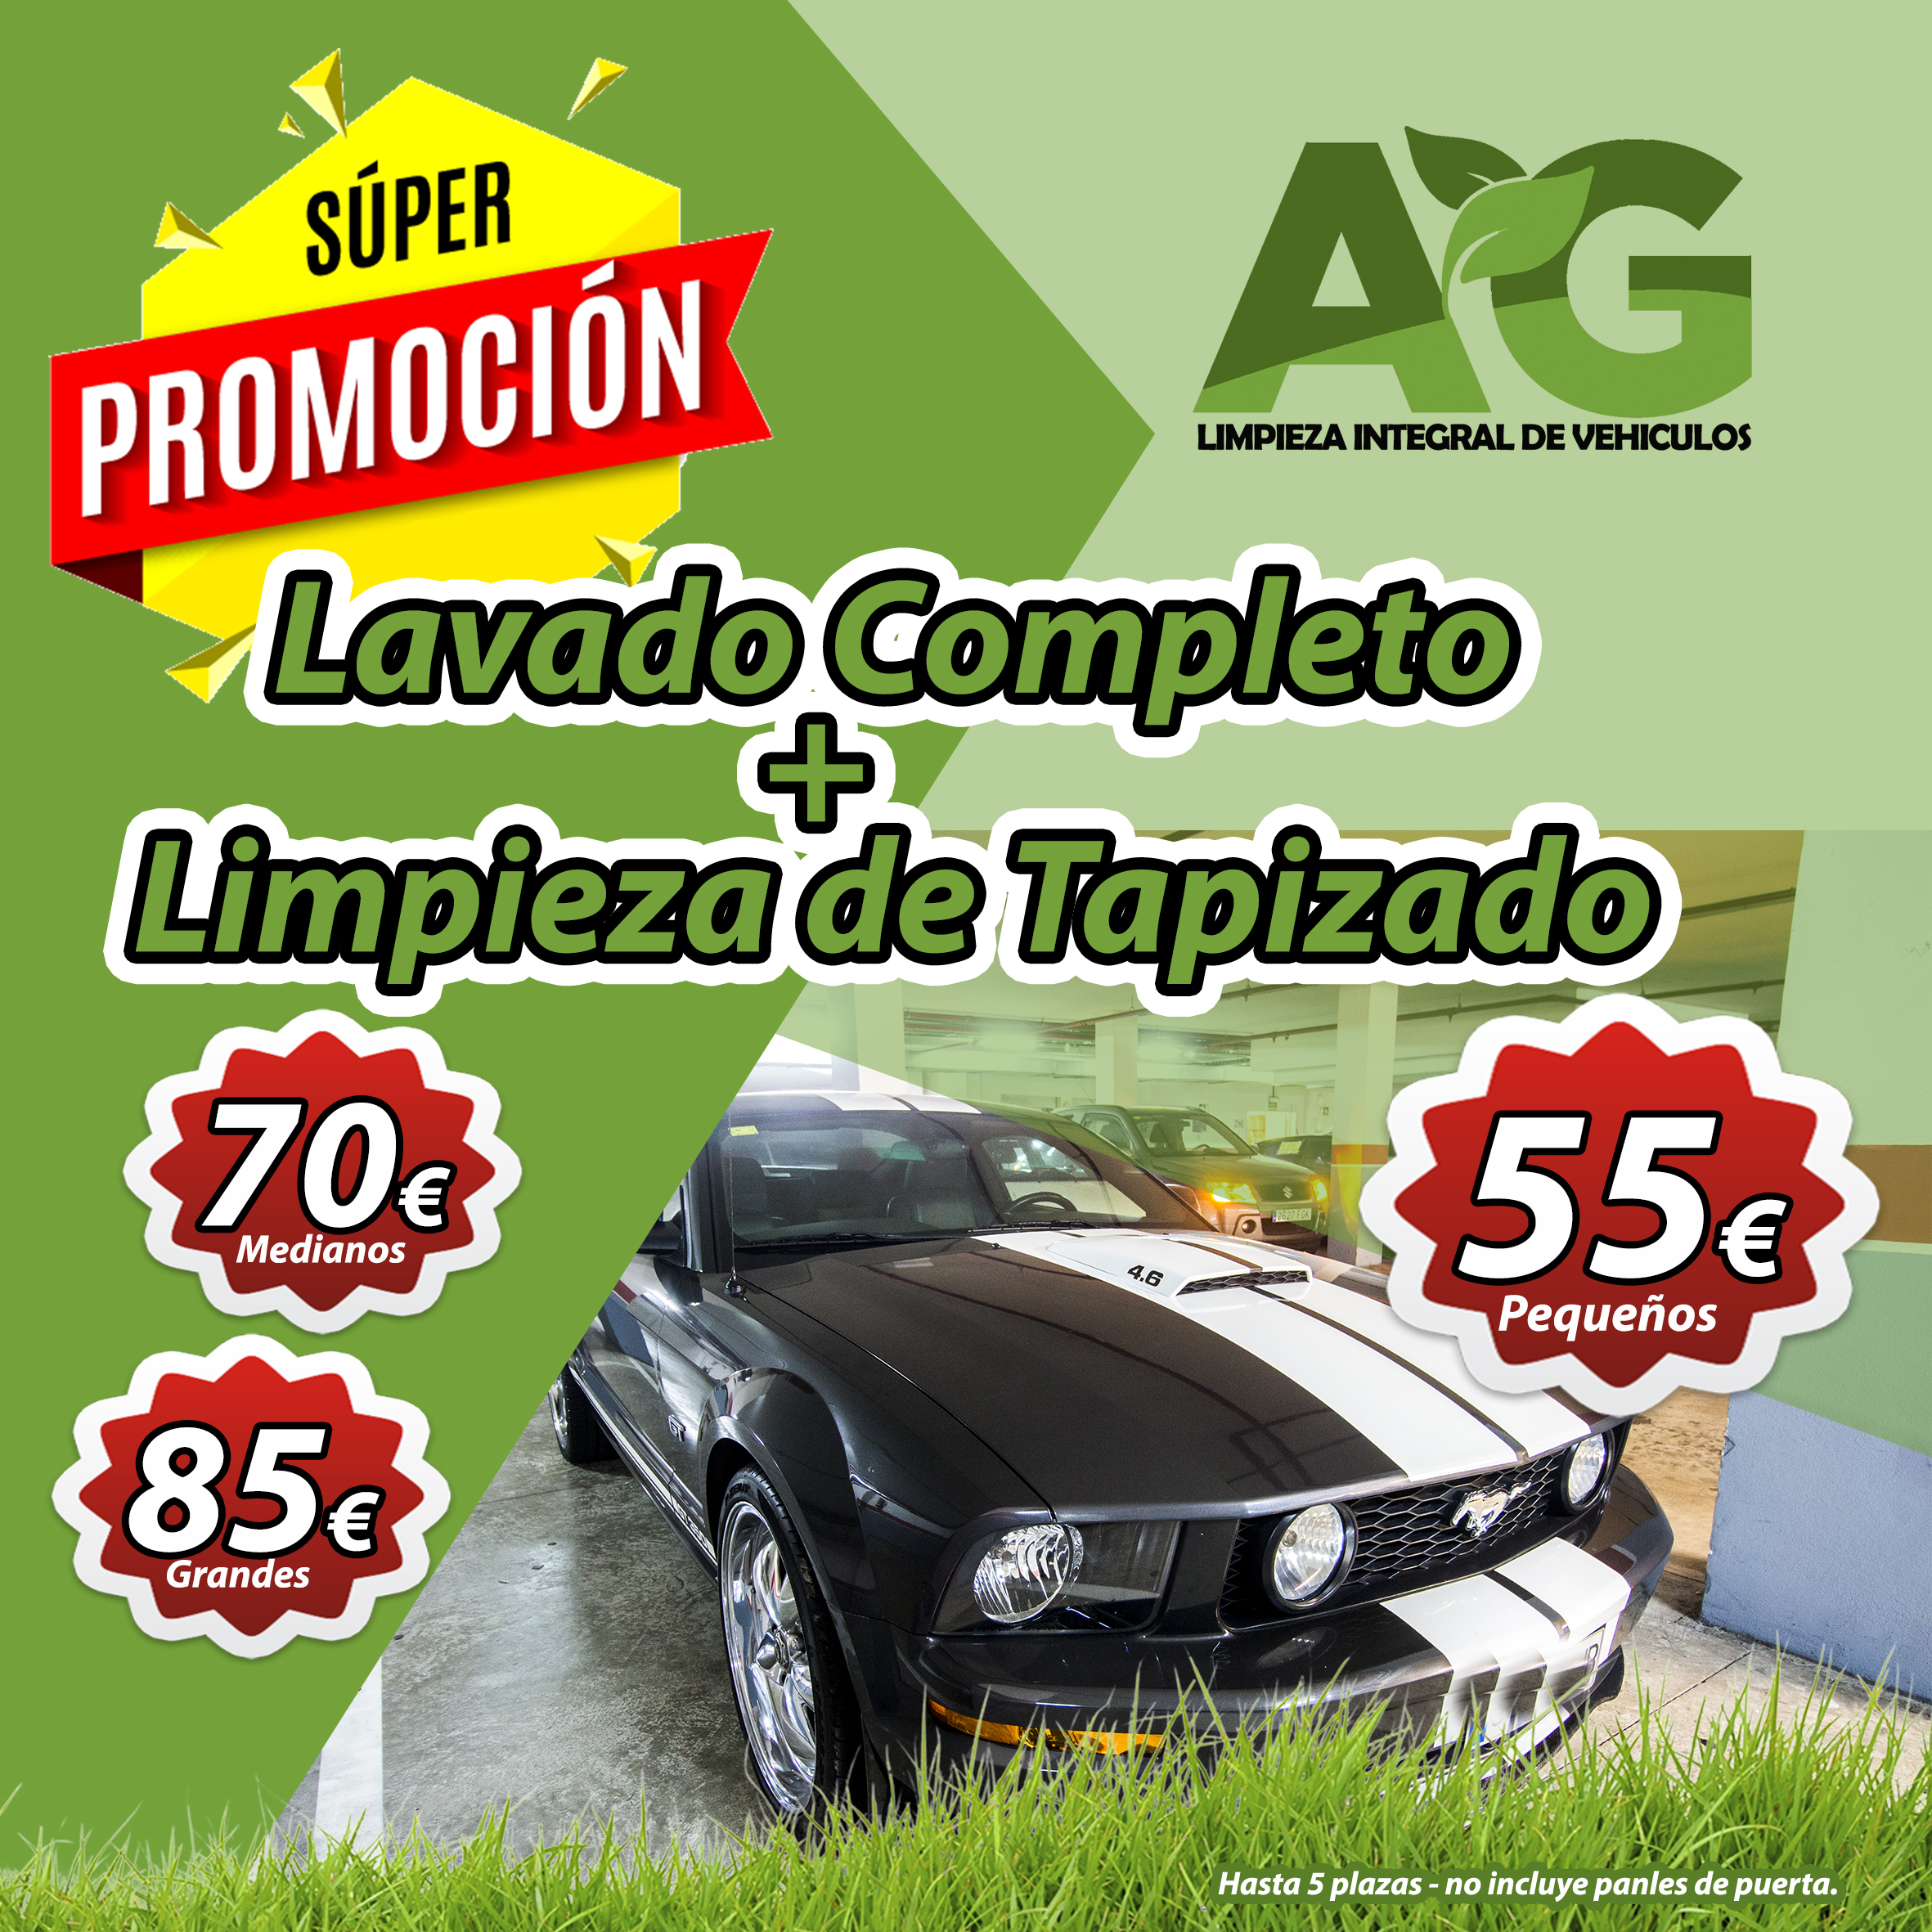 AG Lavados